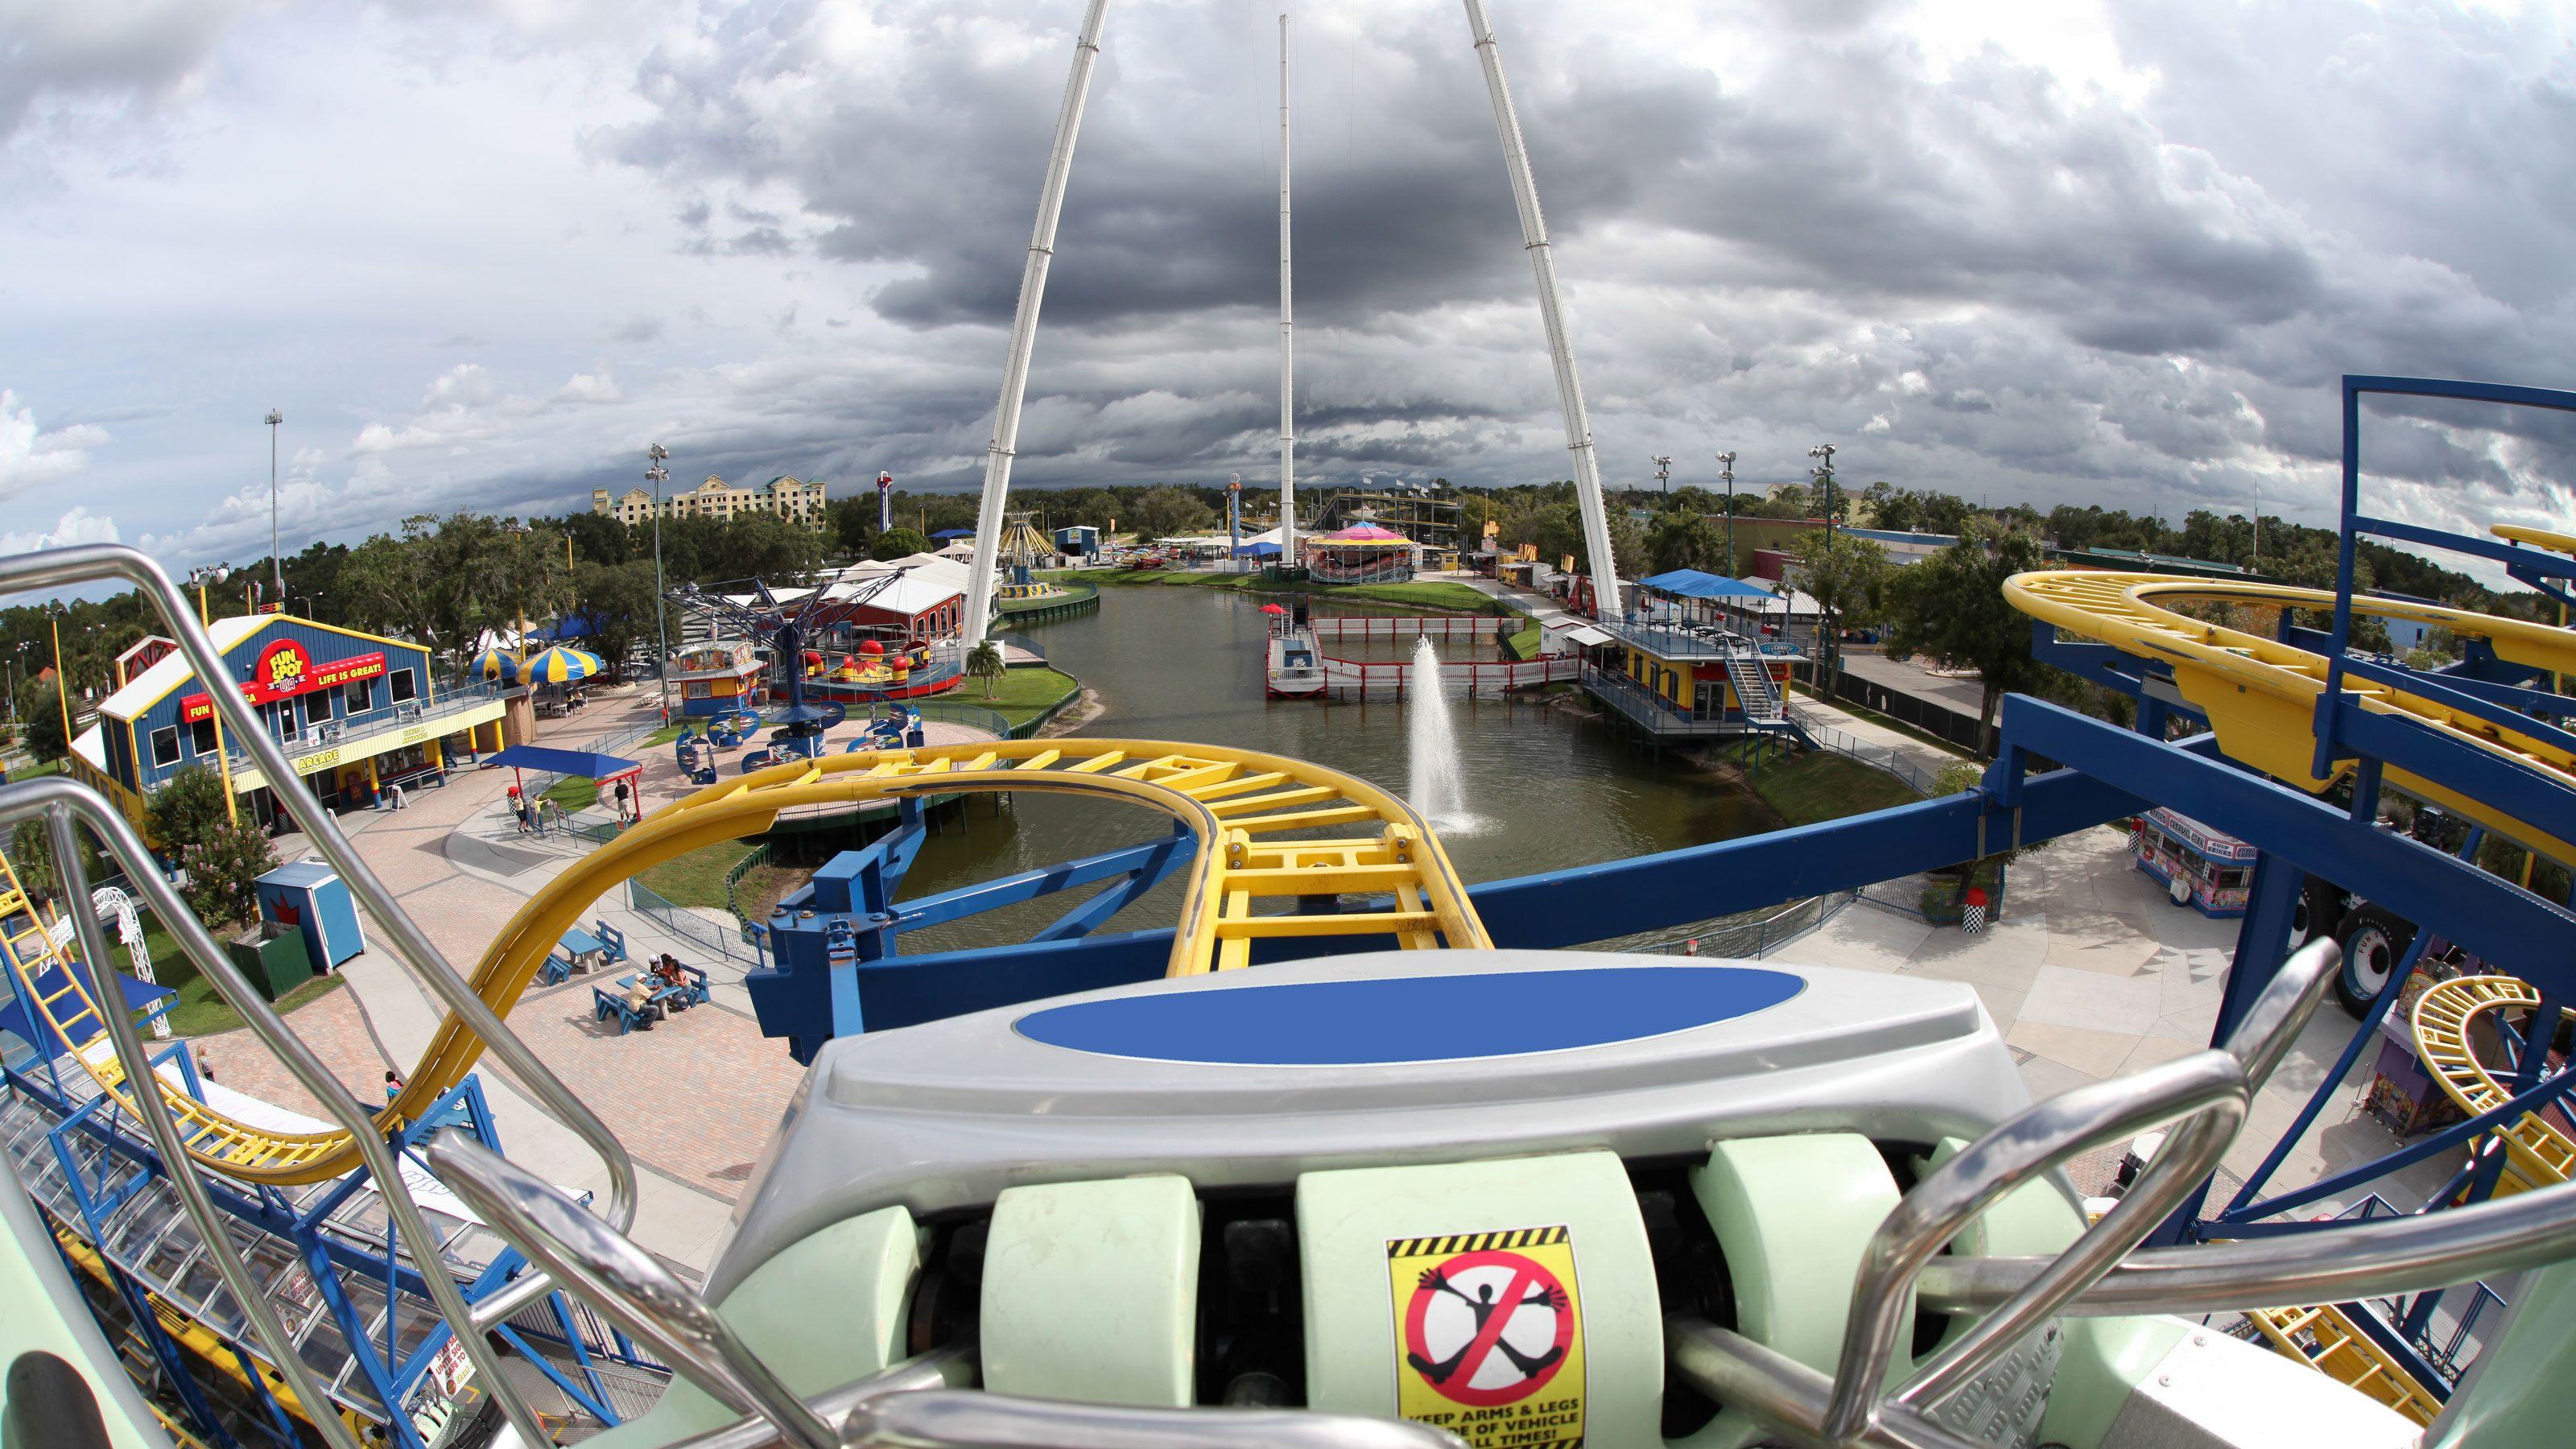 Rollercoaster at Fun Spot America in Orlando.